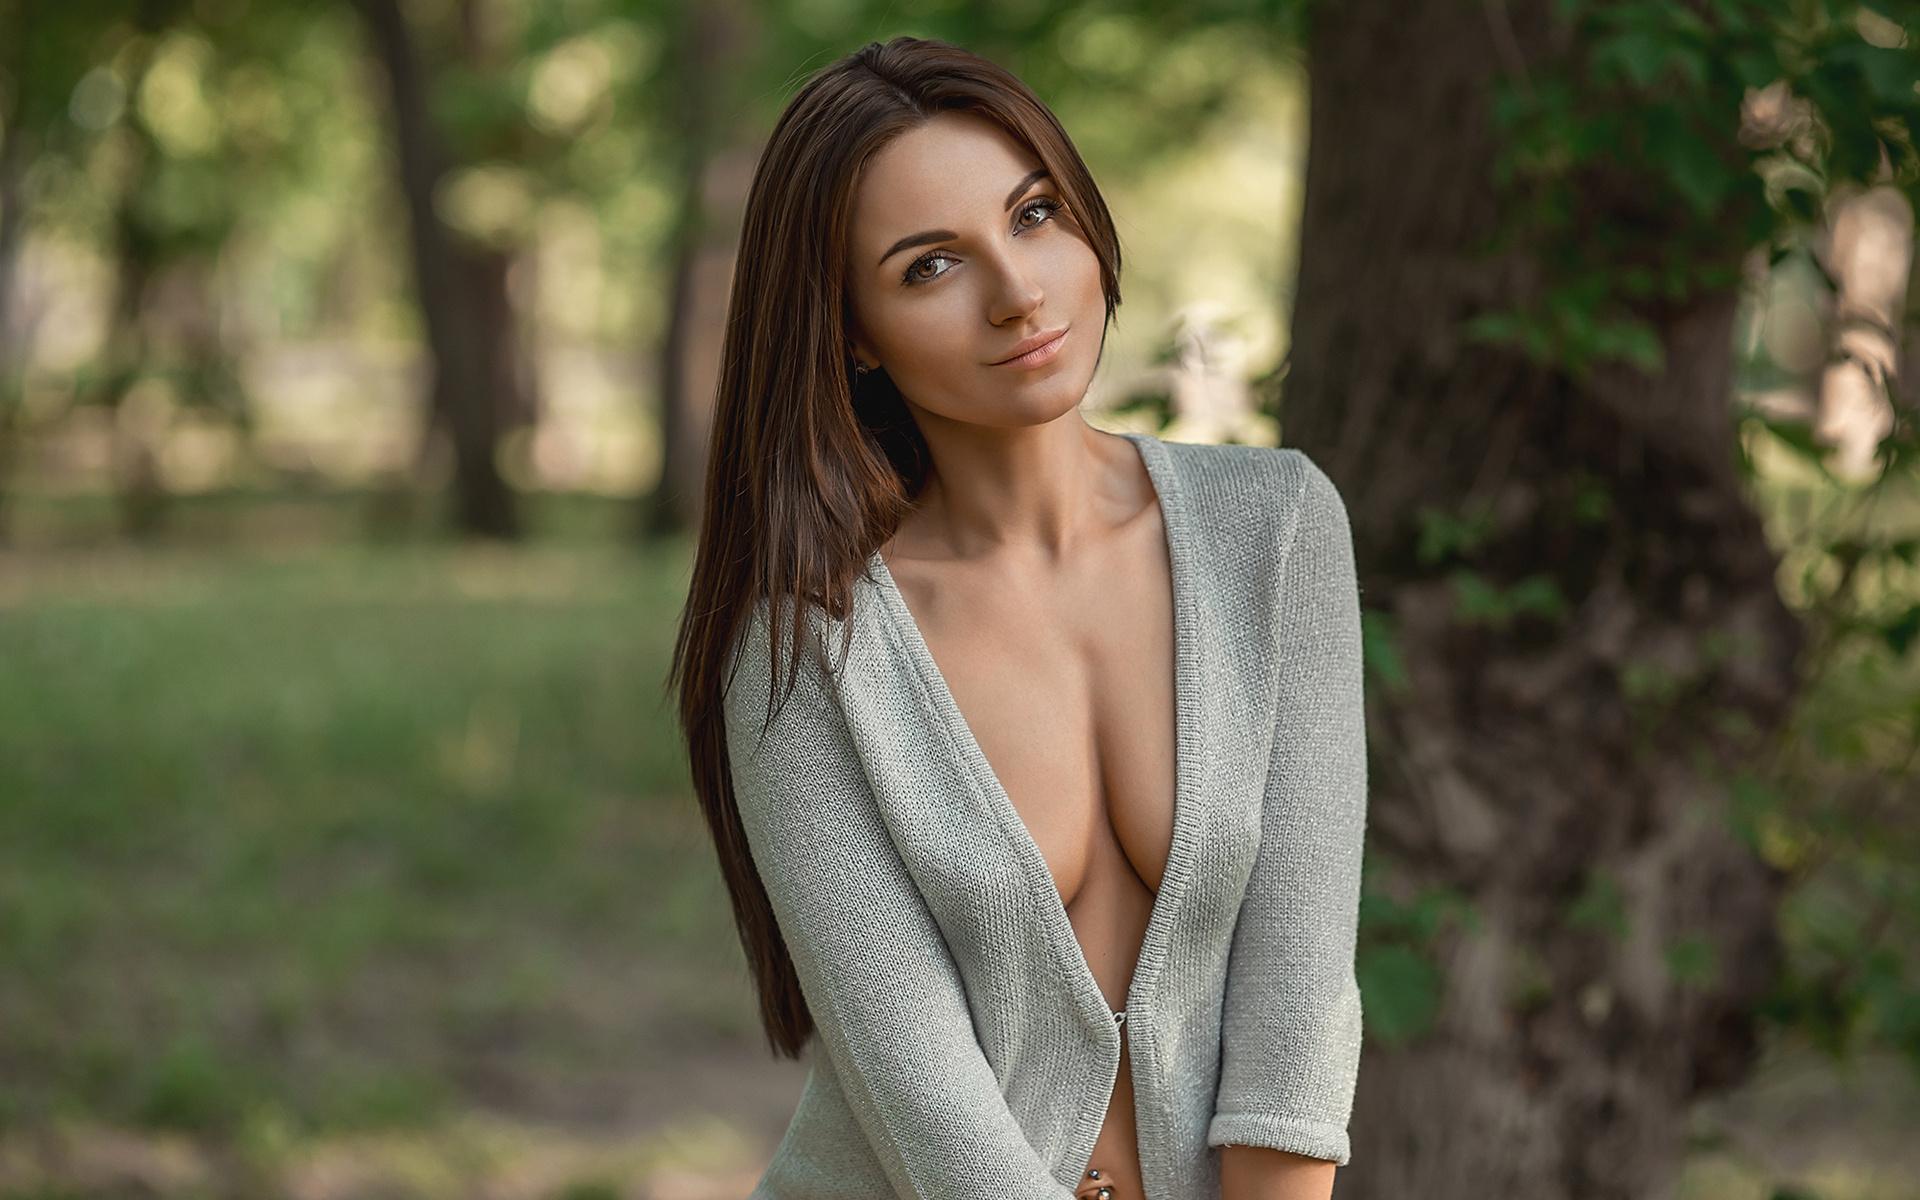 Olga tokarczuk interview